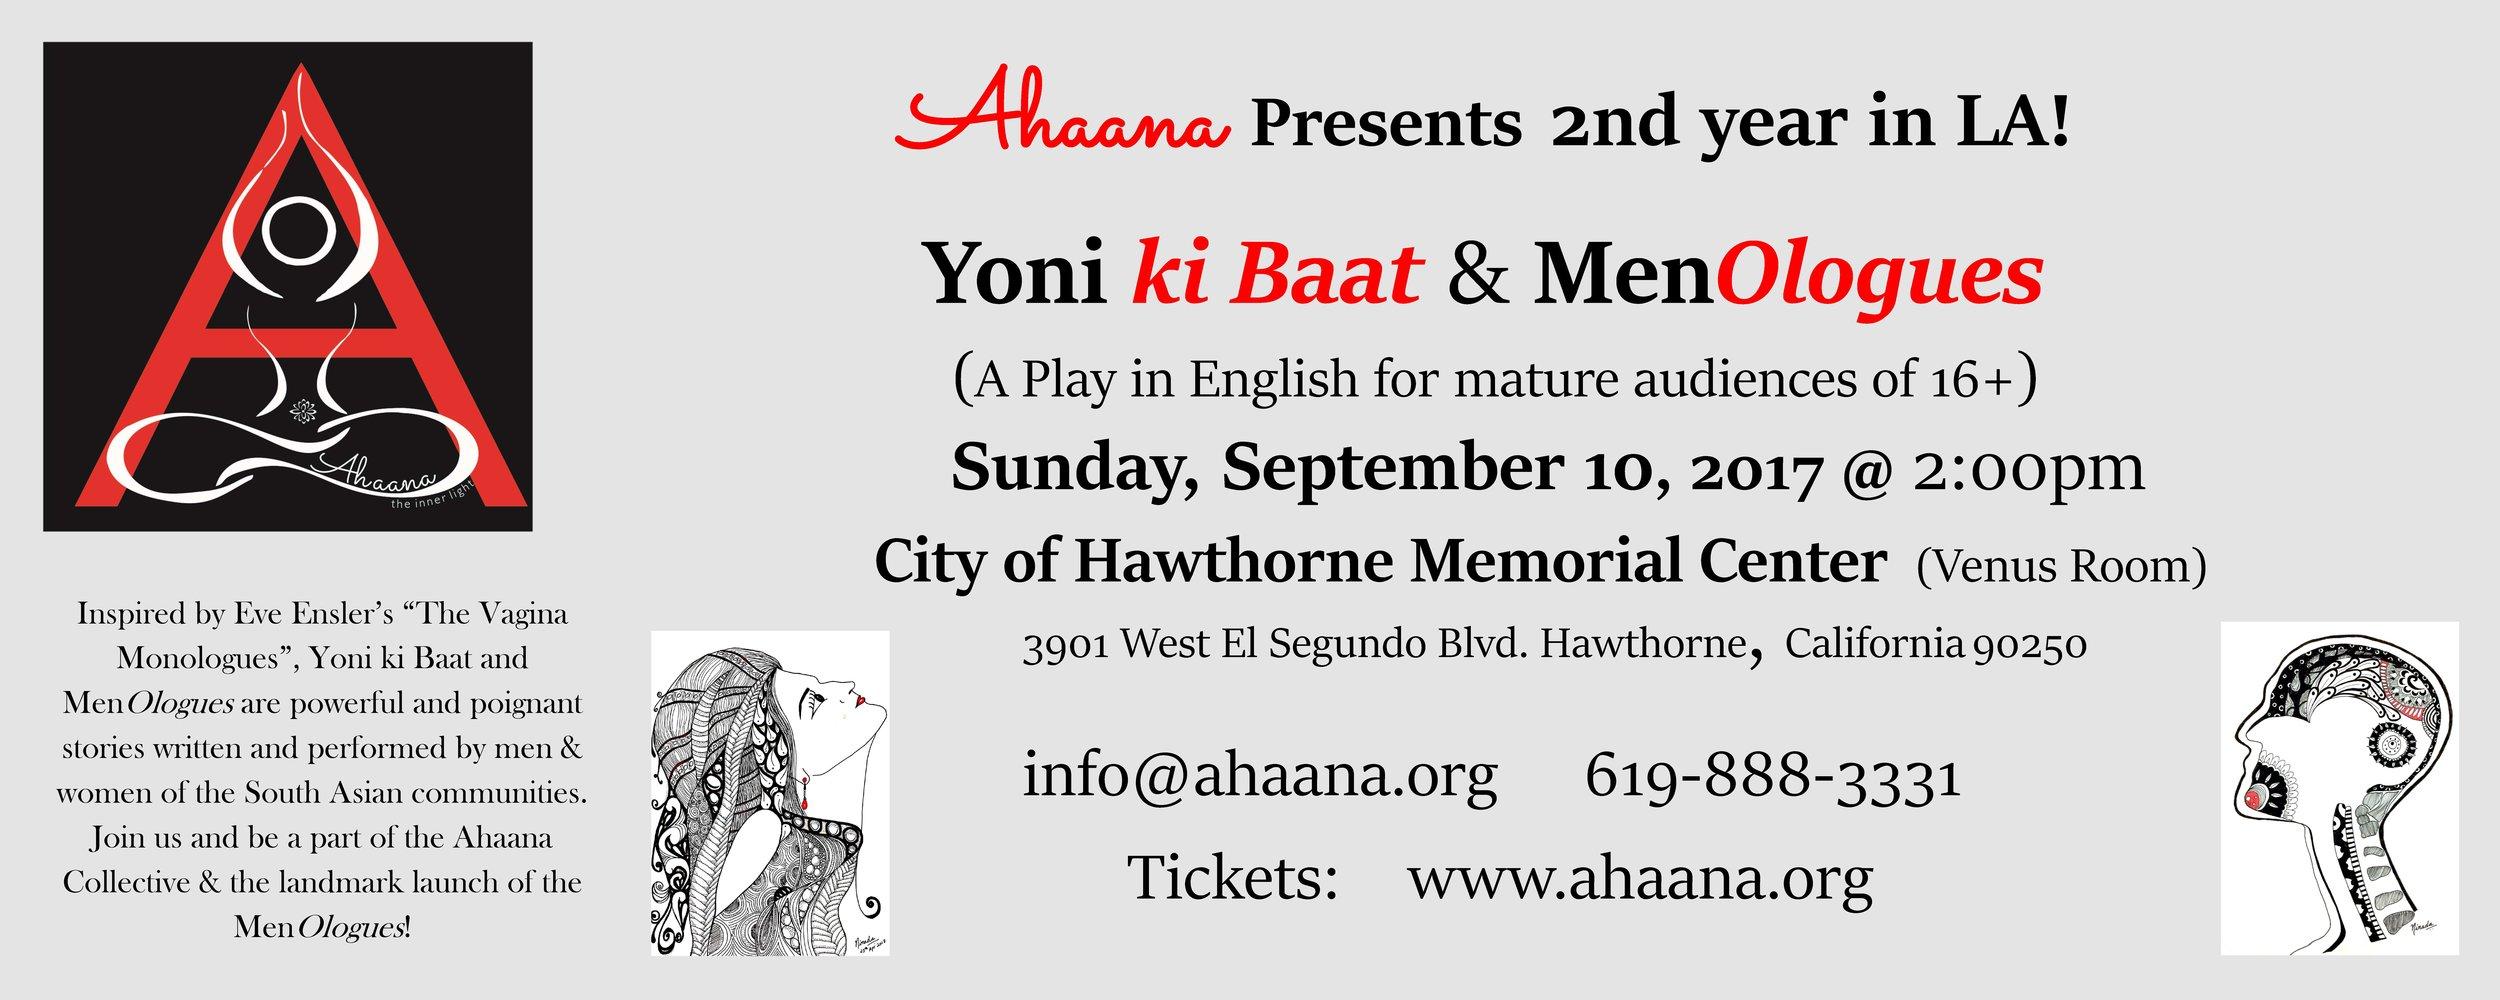 Ahaana Presents Yoni ki Baat & MenOlogues - page 1